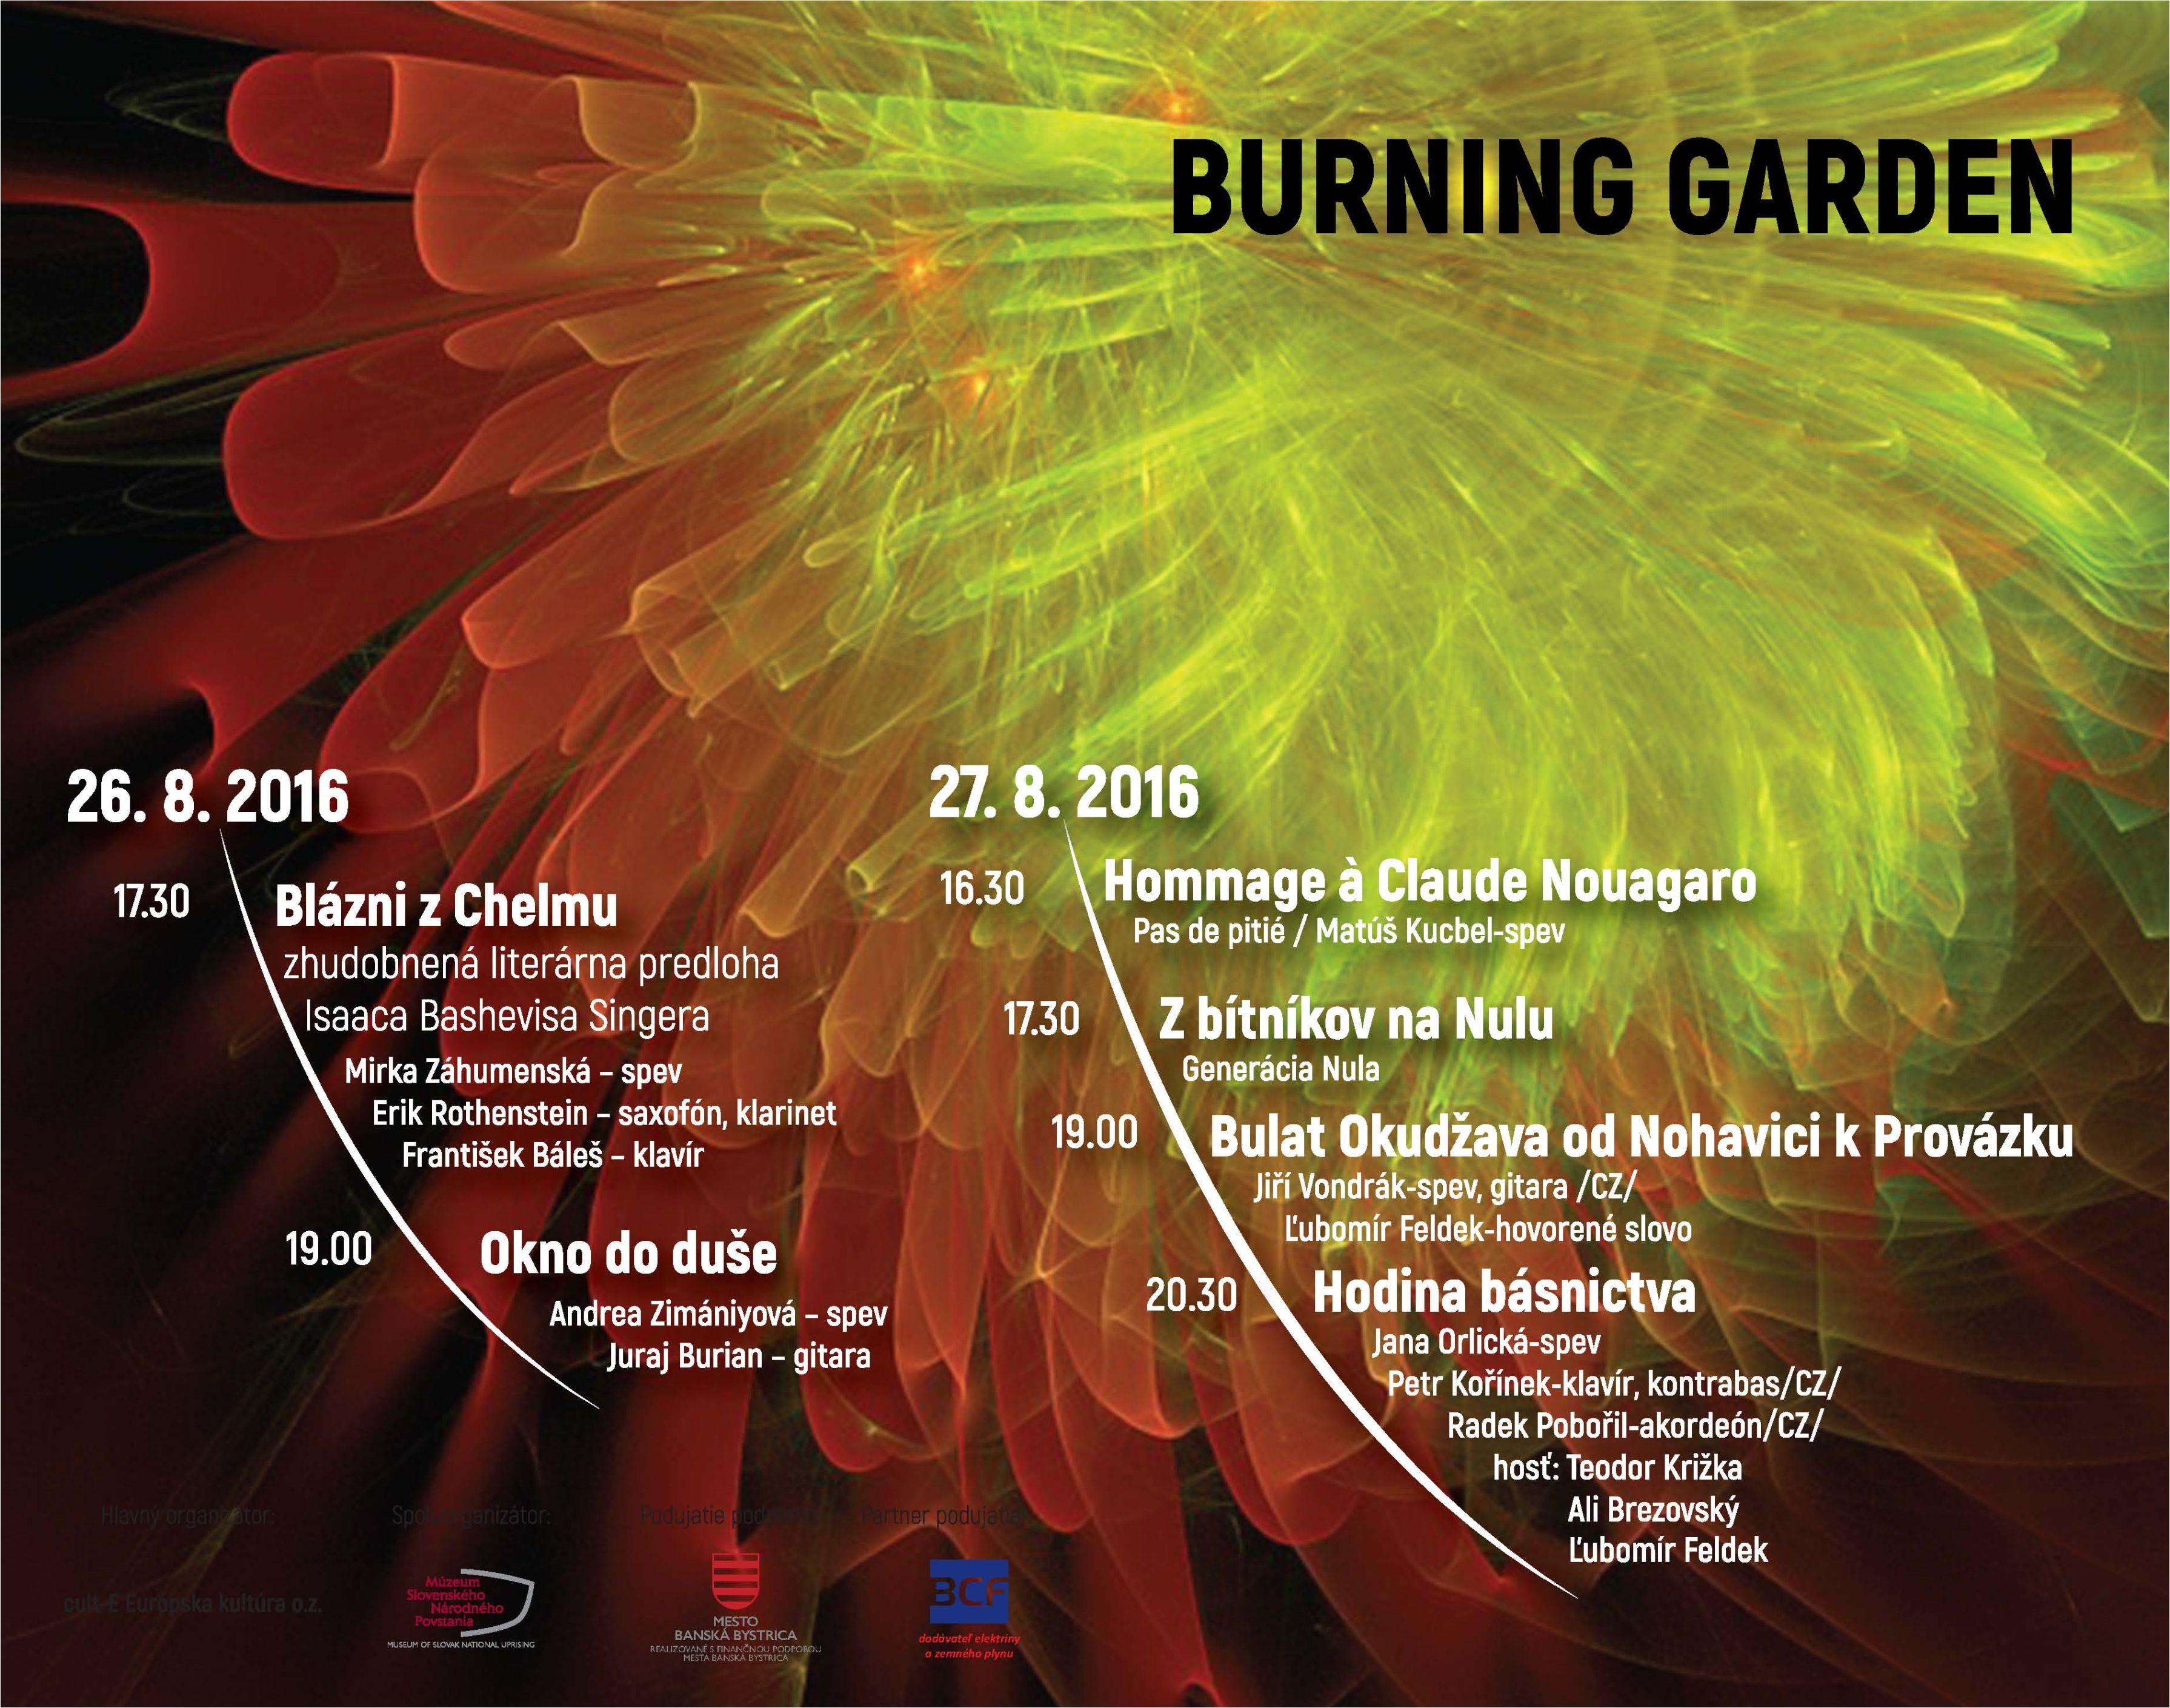 1712de5023f Burning garden - Medzinárodný festival š - Kam v meste